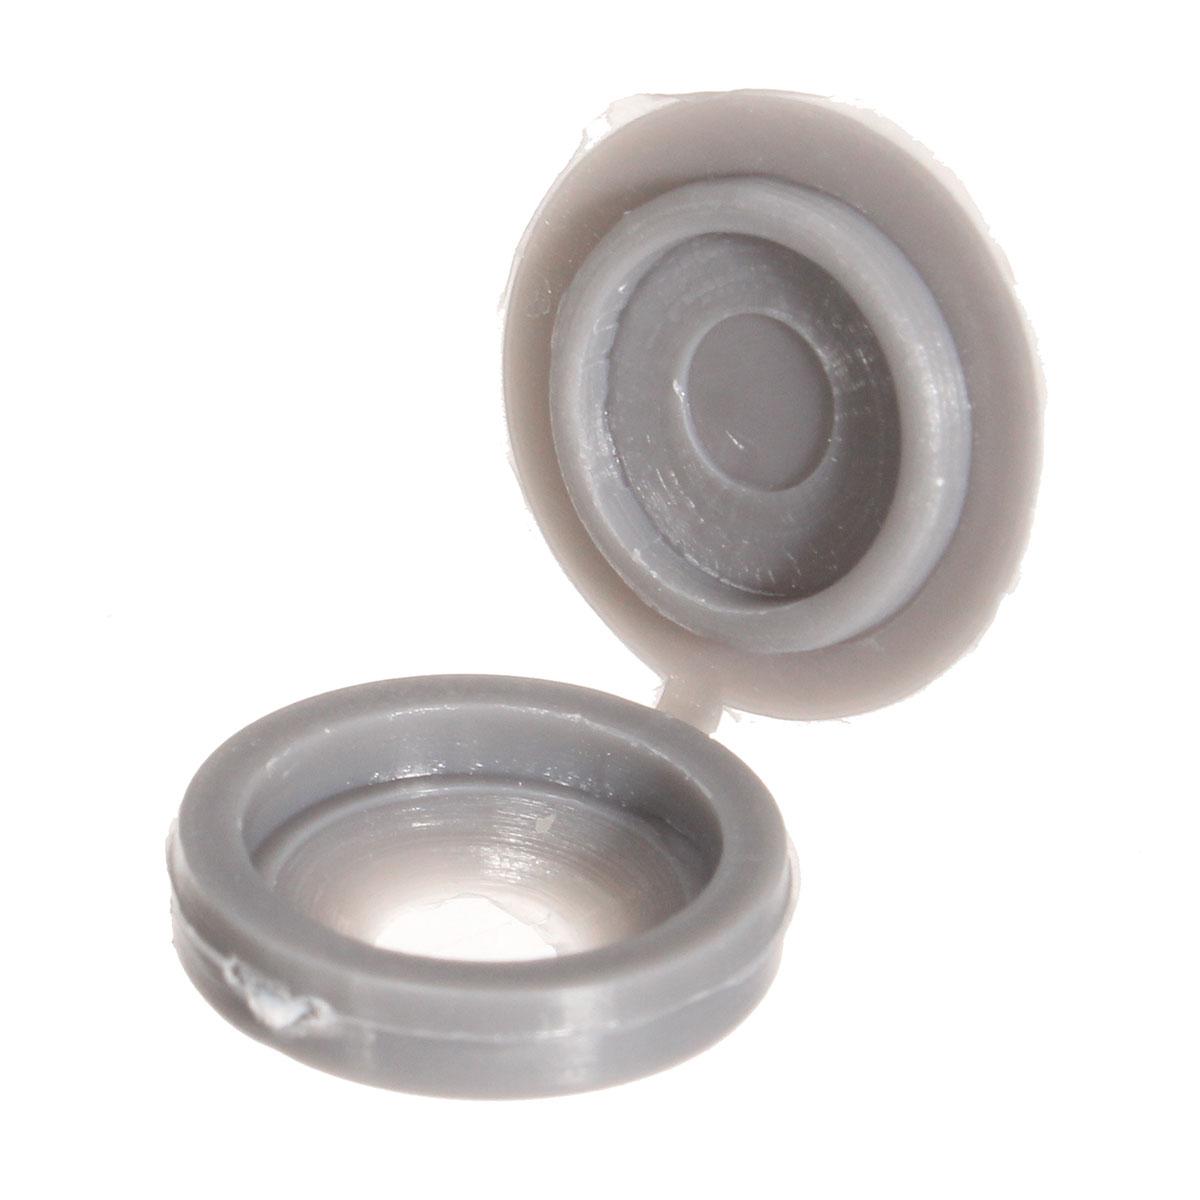 50pcs hinge plastic screw covers caps 6mm hole screw. Black Bedroom Furniture Sets. Home Design Ideas